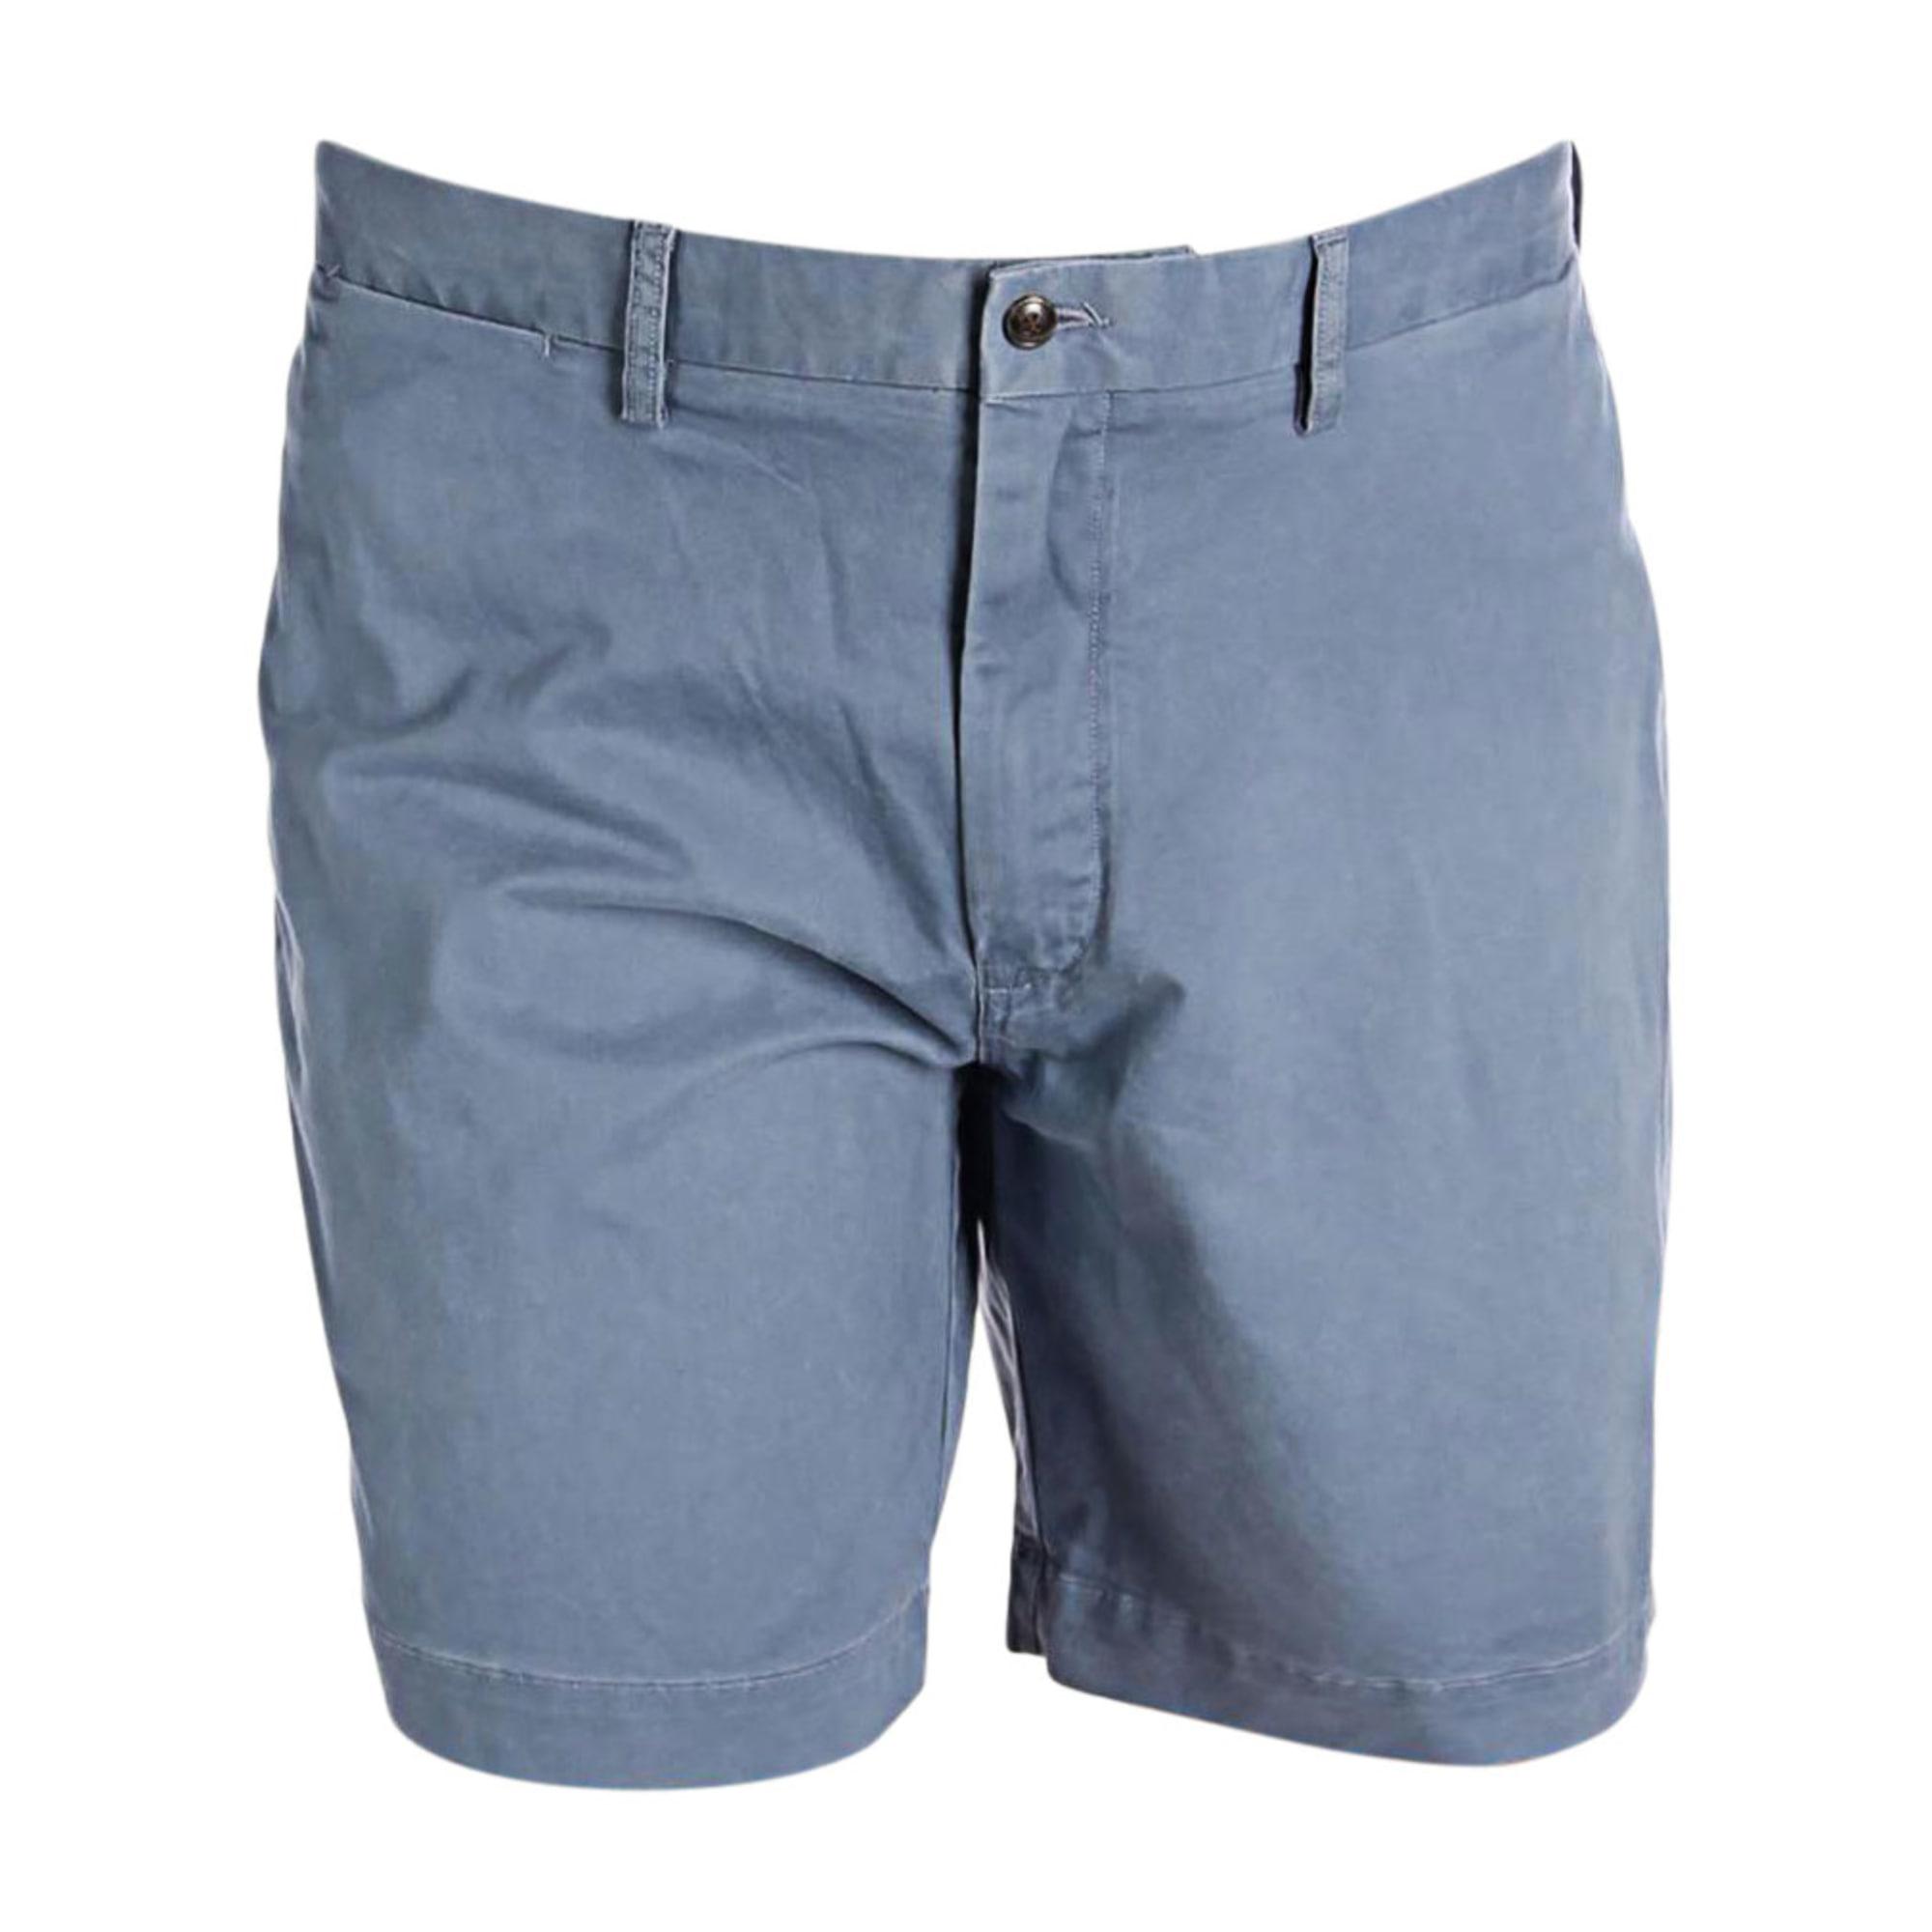 Bleu Ralph Lauren Toile Polo Marine Short W2IEH9D